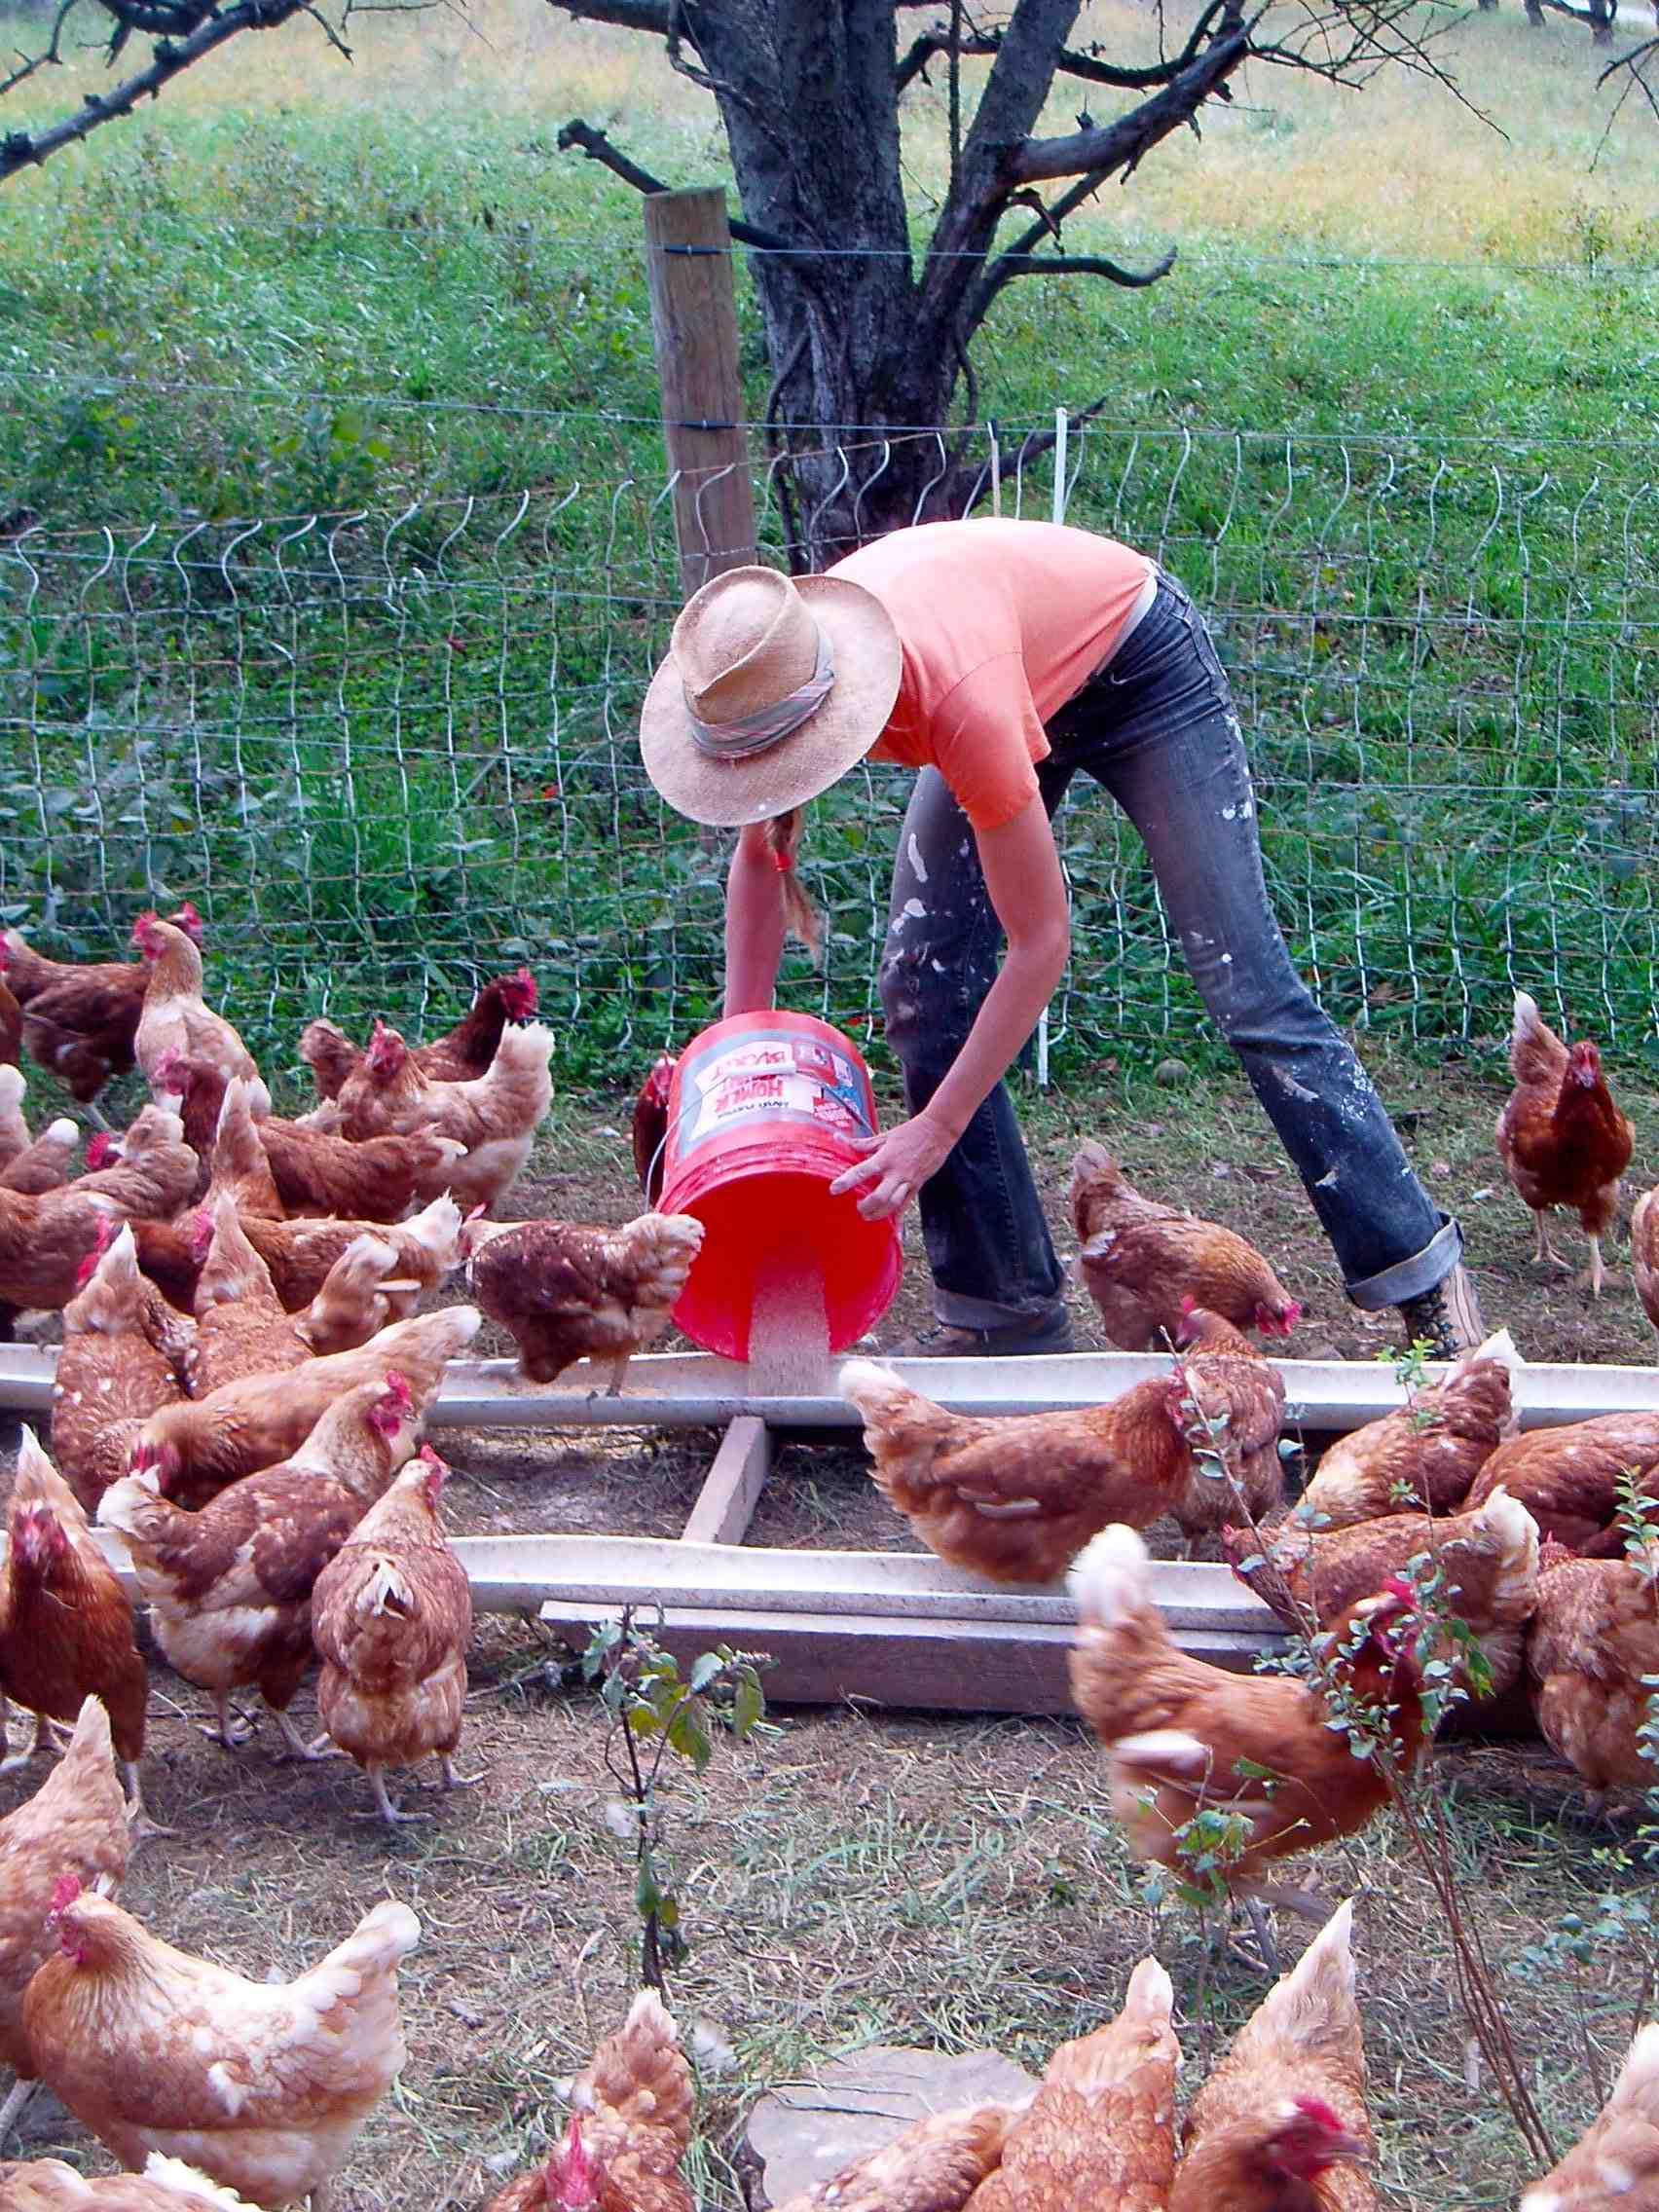 Feeding Chickens - Smith Meadows